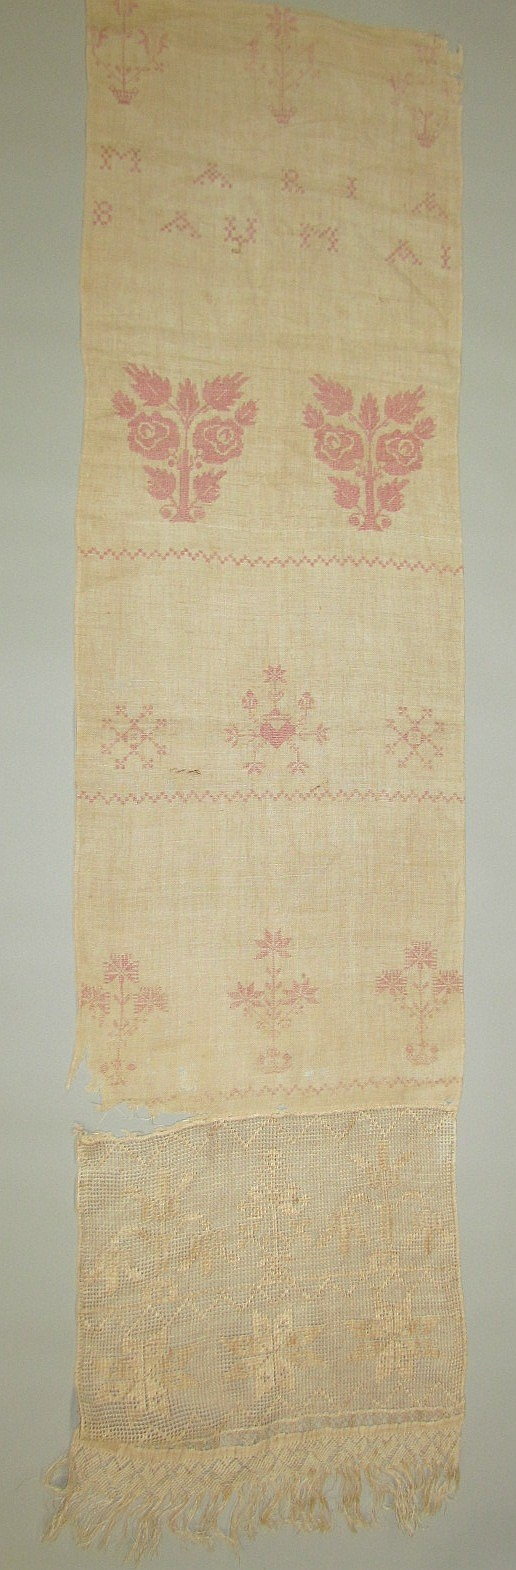 Early full length show towel by Maria Bauman